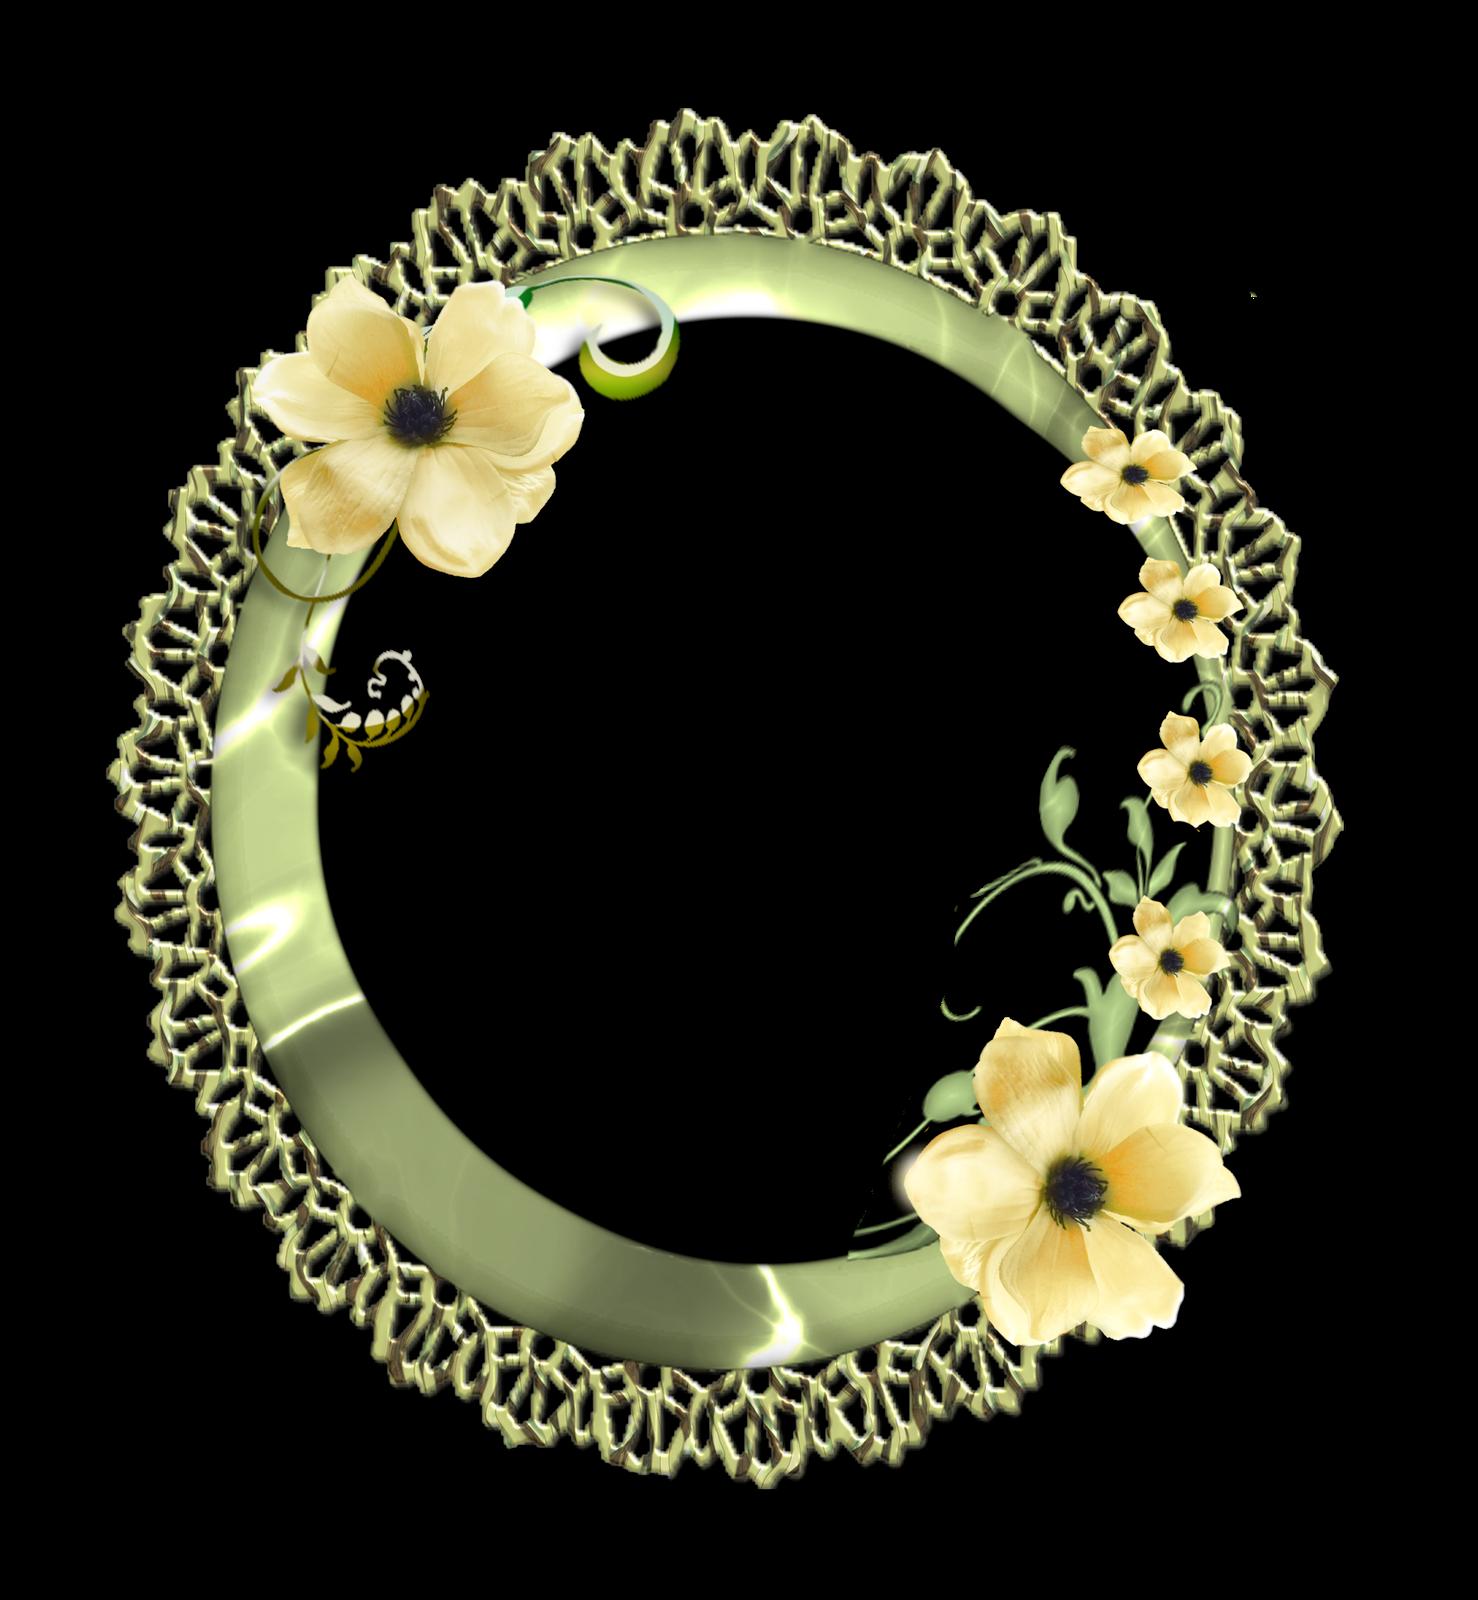 Colecci n de gifs marcos para fotos de flores - Marcos de fotos grandes ...